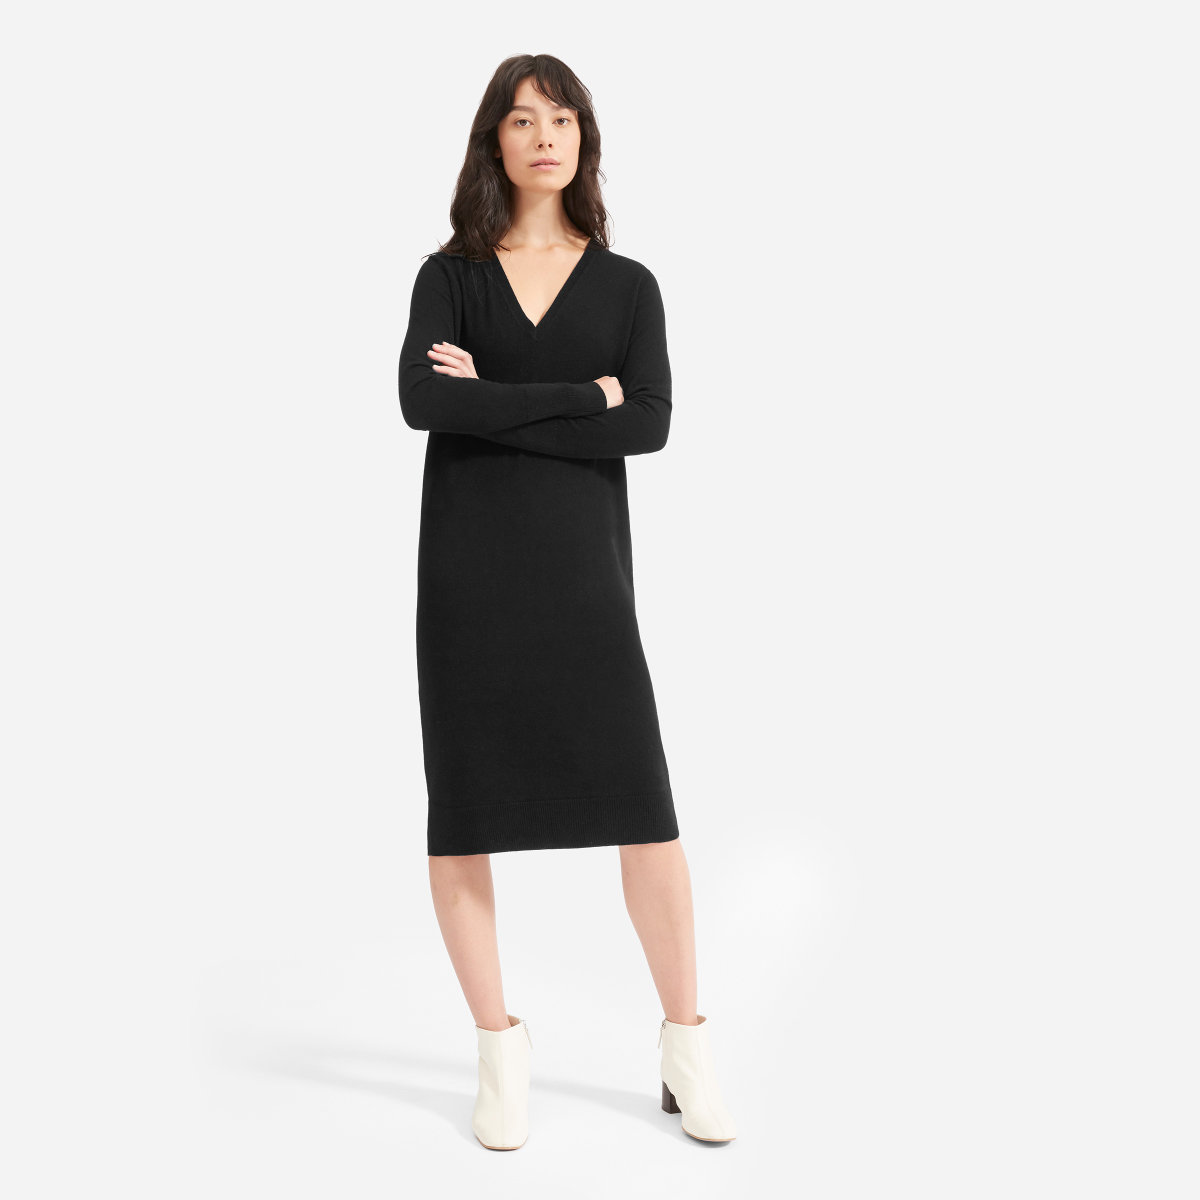 ee5c2aeab4e0e The Cashmere V-Neck Midi Dress